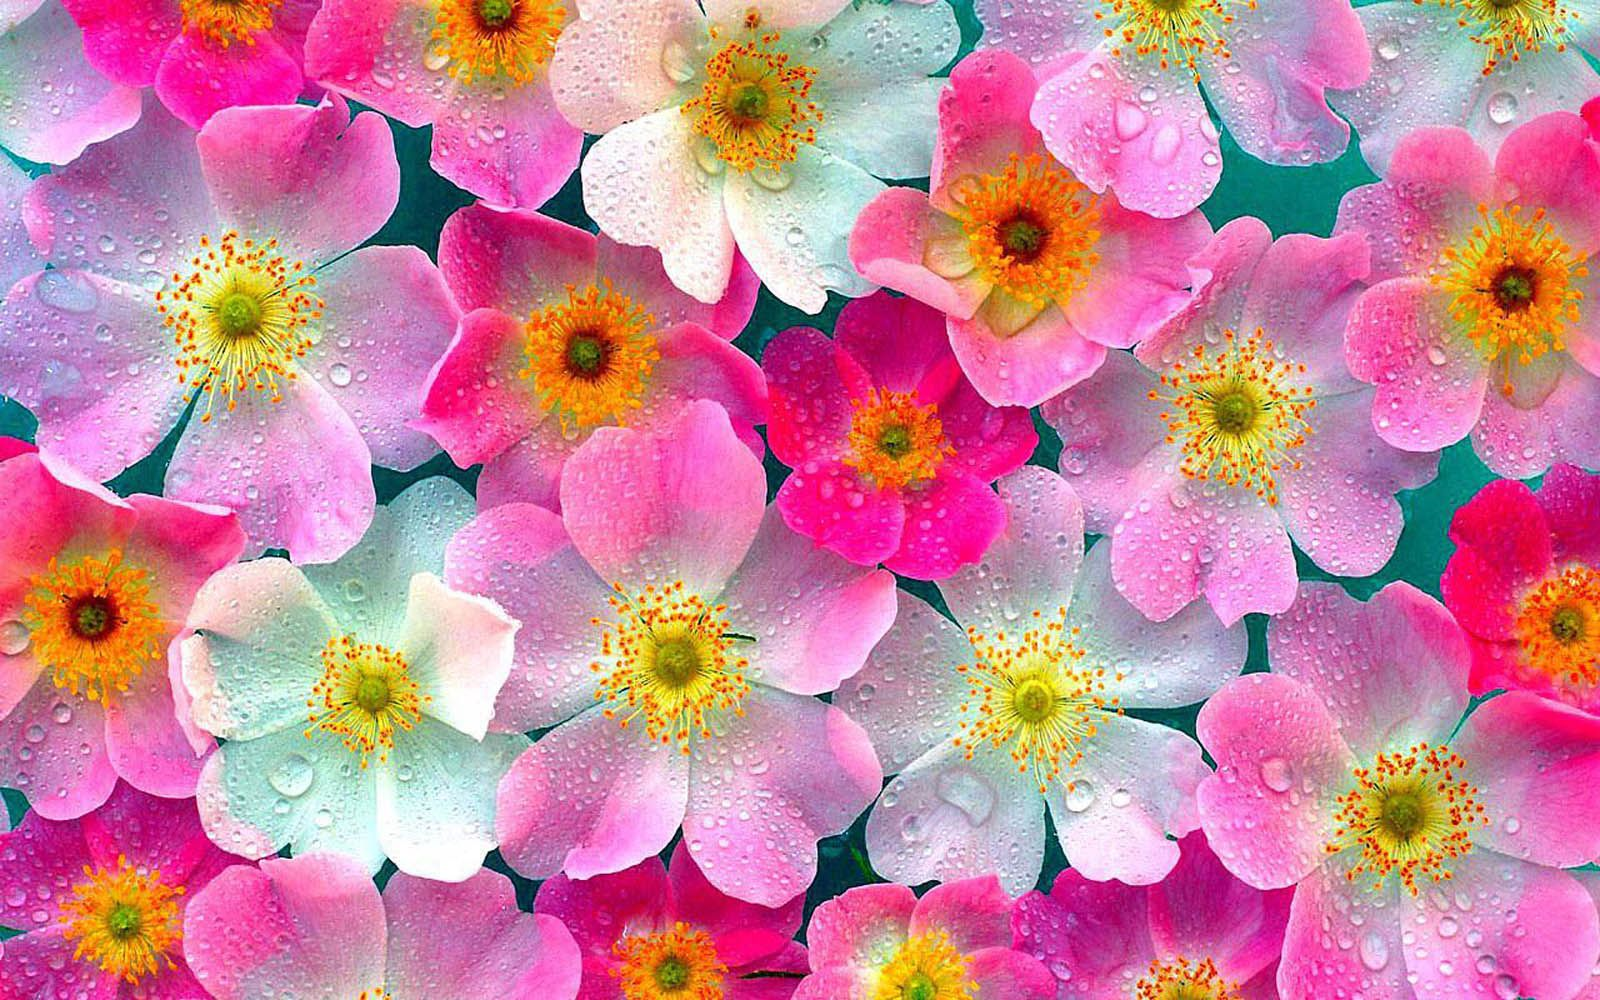 Wallpapers pink flowers wallpapers ideas digitales pinterest wallpapers pink flowers wallpapers izmirmasajfo